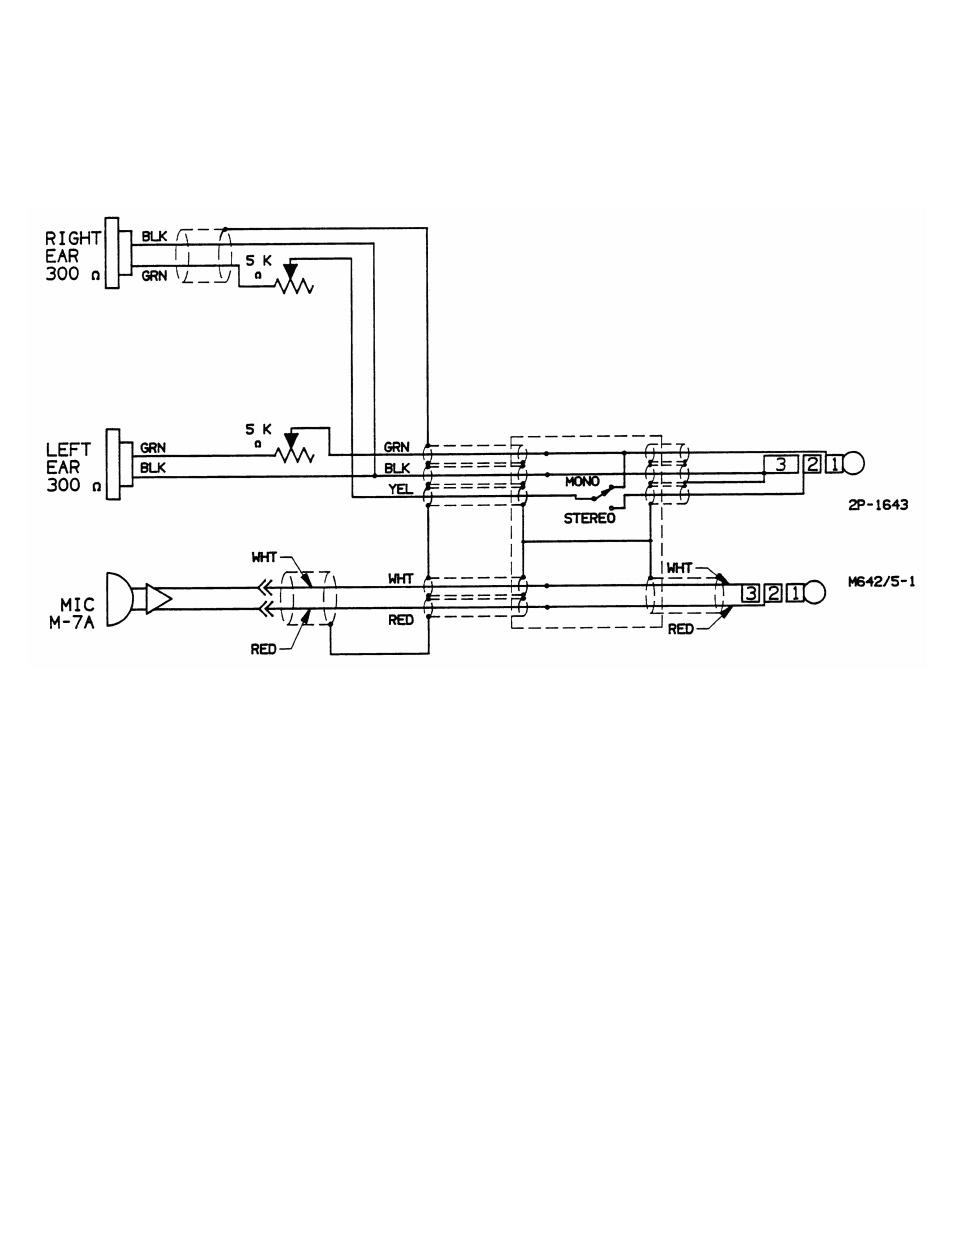 medium resolution of clark gcx30e wiring diagram wiring diagram centre clark gcx30e wiring diagram